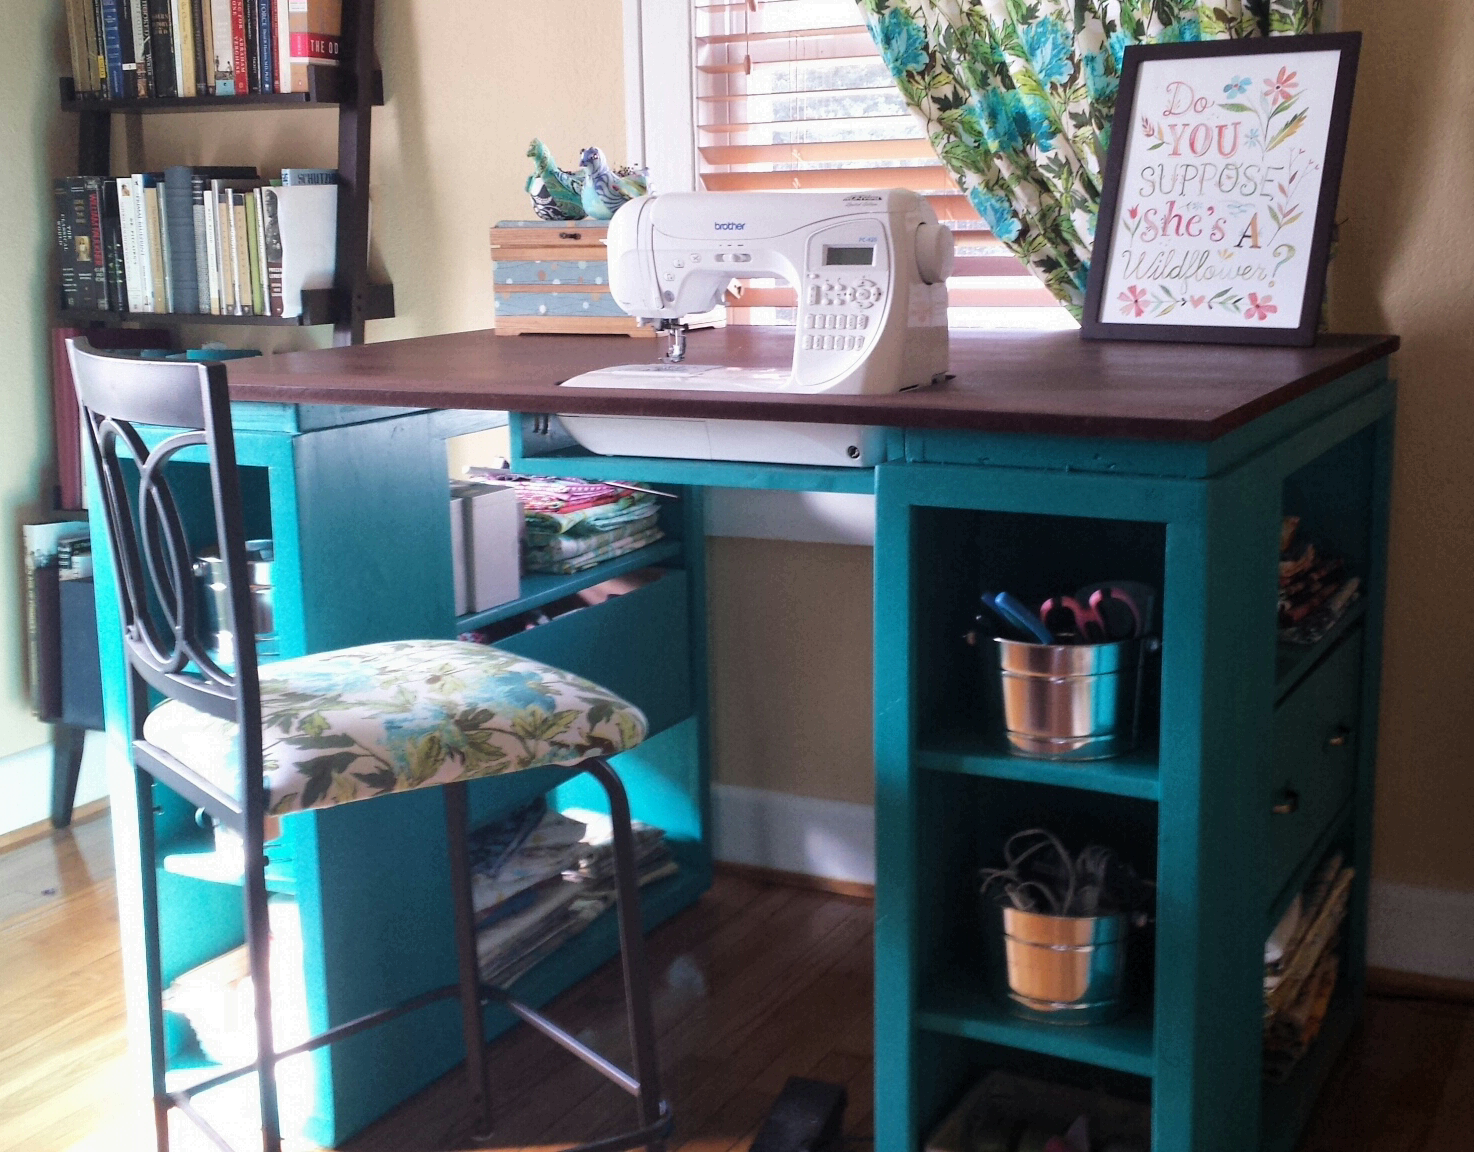 pin by meg meeker on home run ideas pinterest. Black Bedroom Furniture Sets. Home Design Ideas